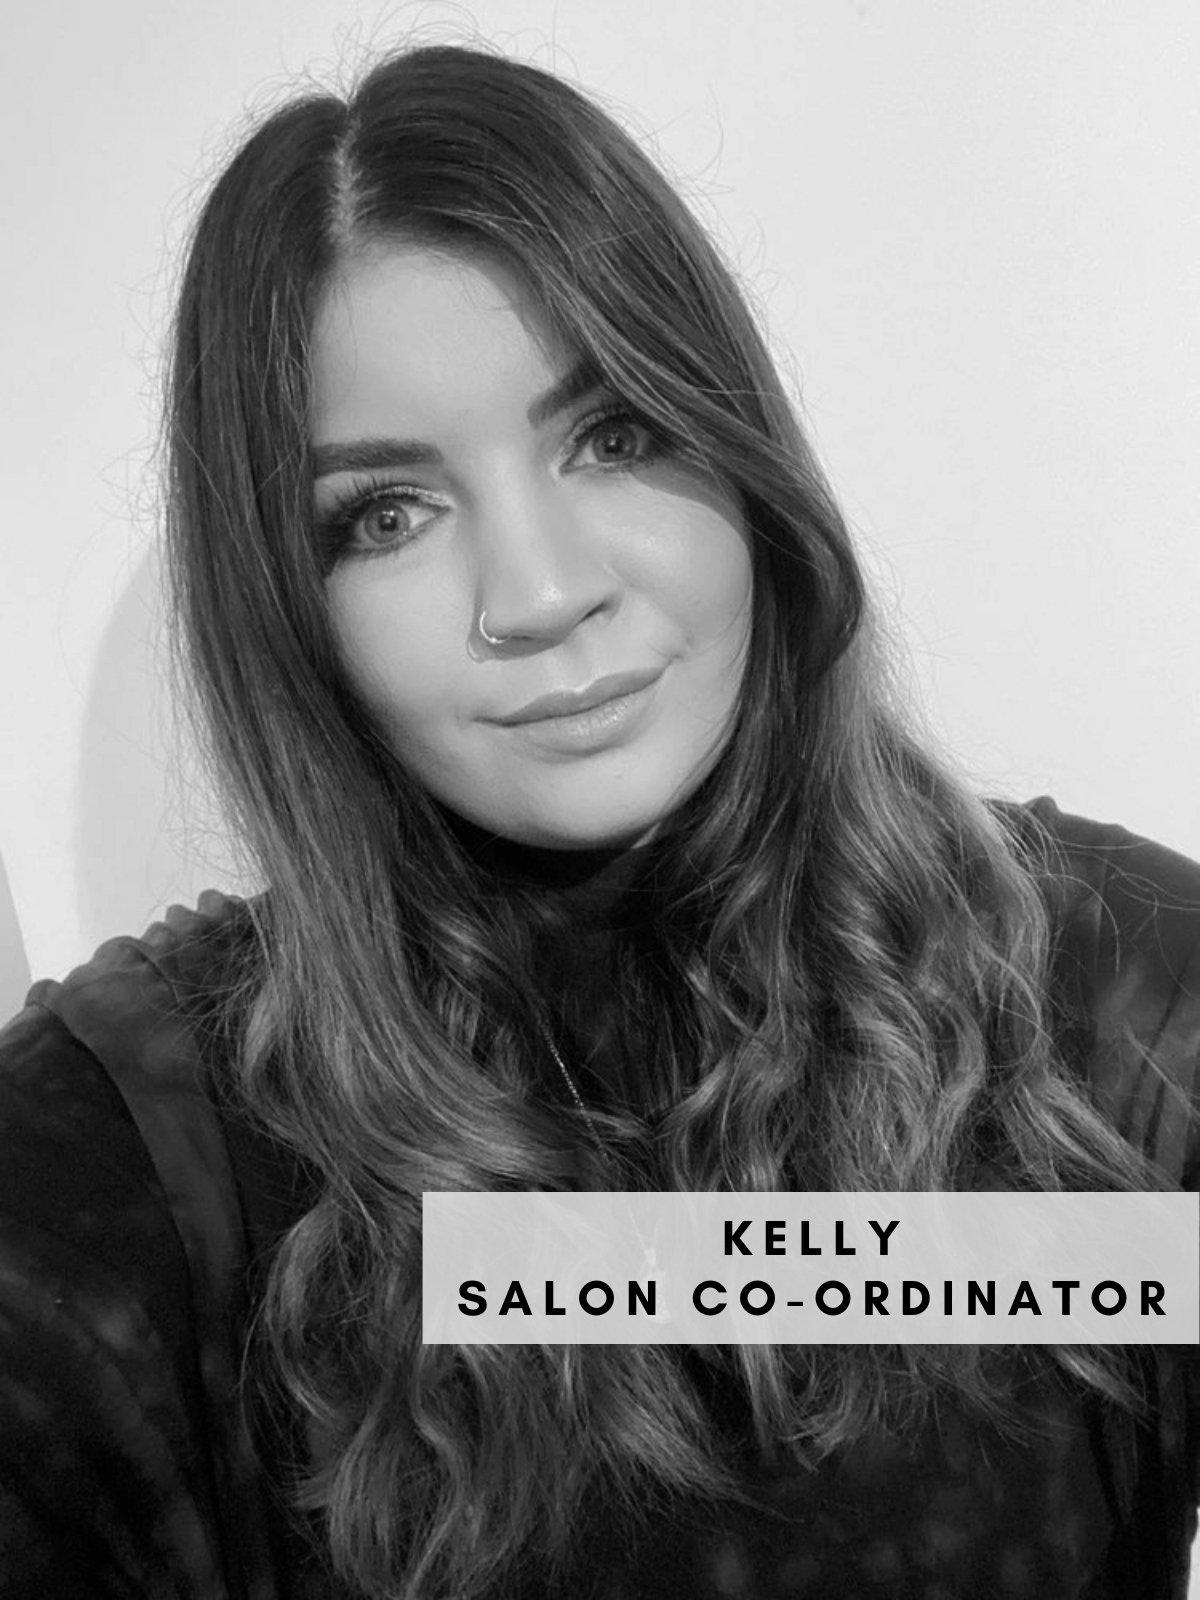 Kelly – Salon Co-ordinator